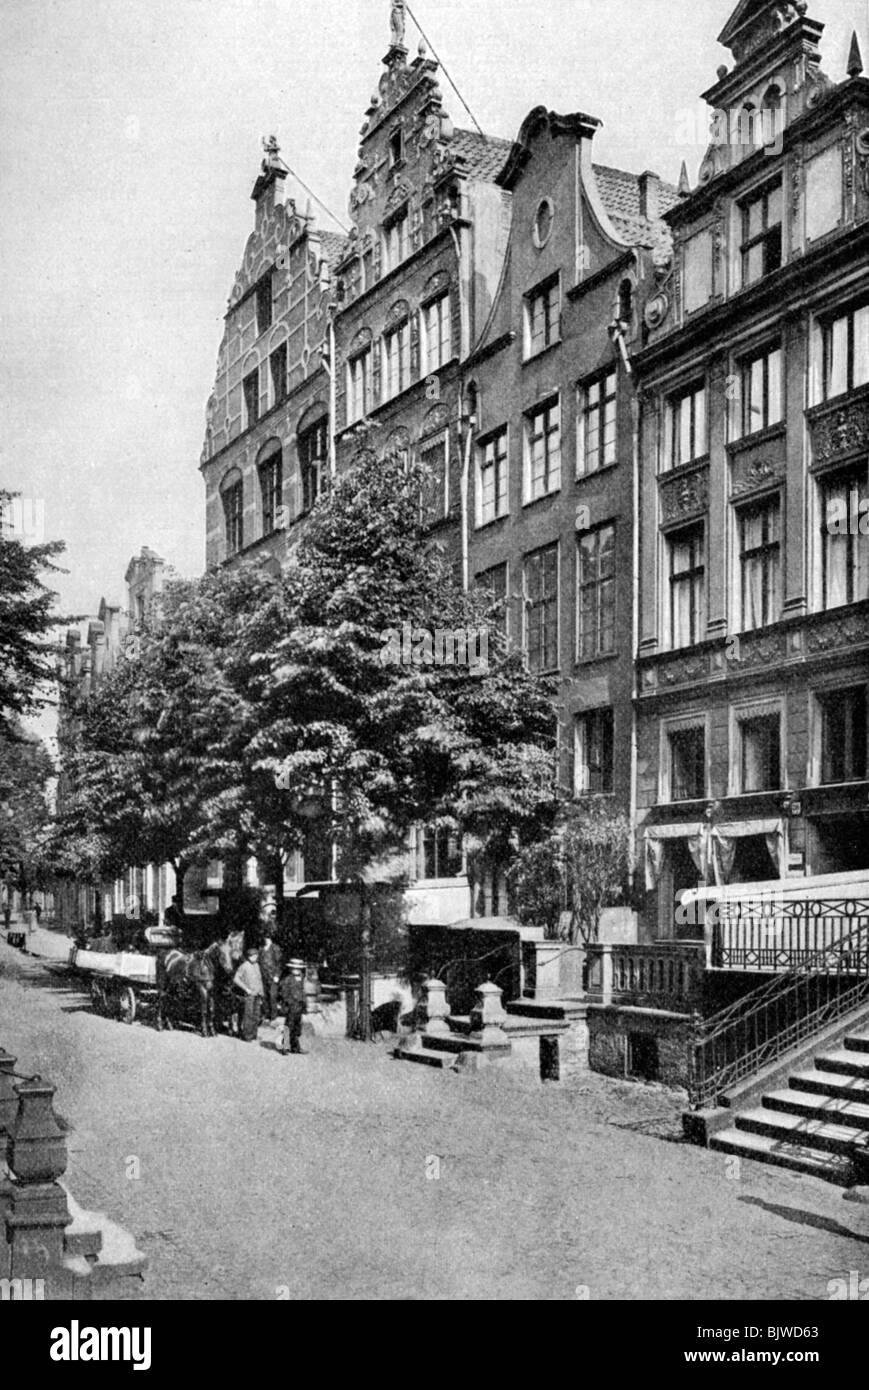 Houses on the Brodbankengasse, Danzig, c1922. - Stock Image